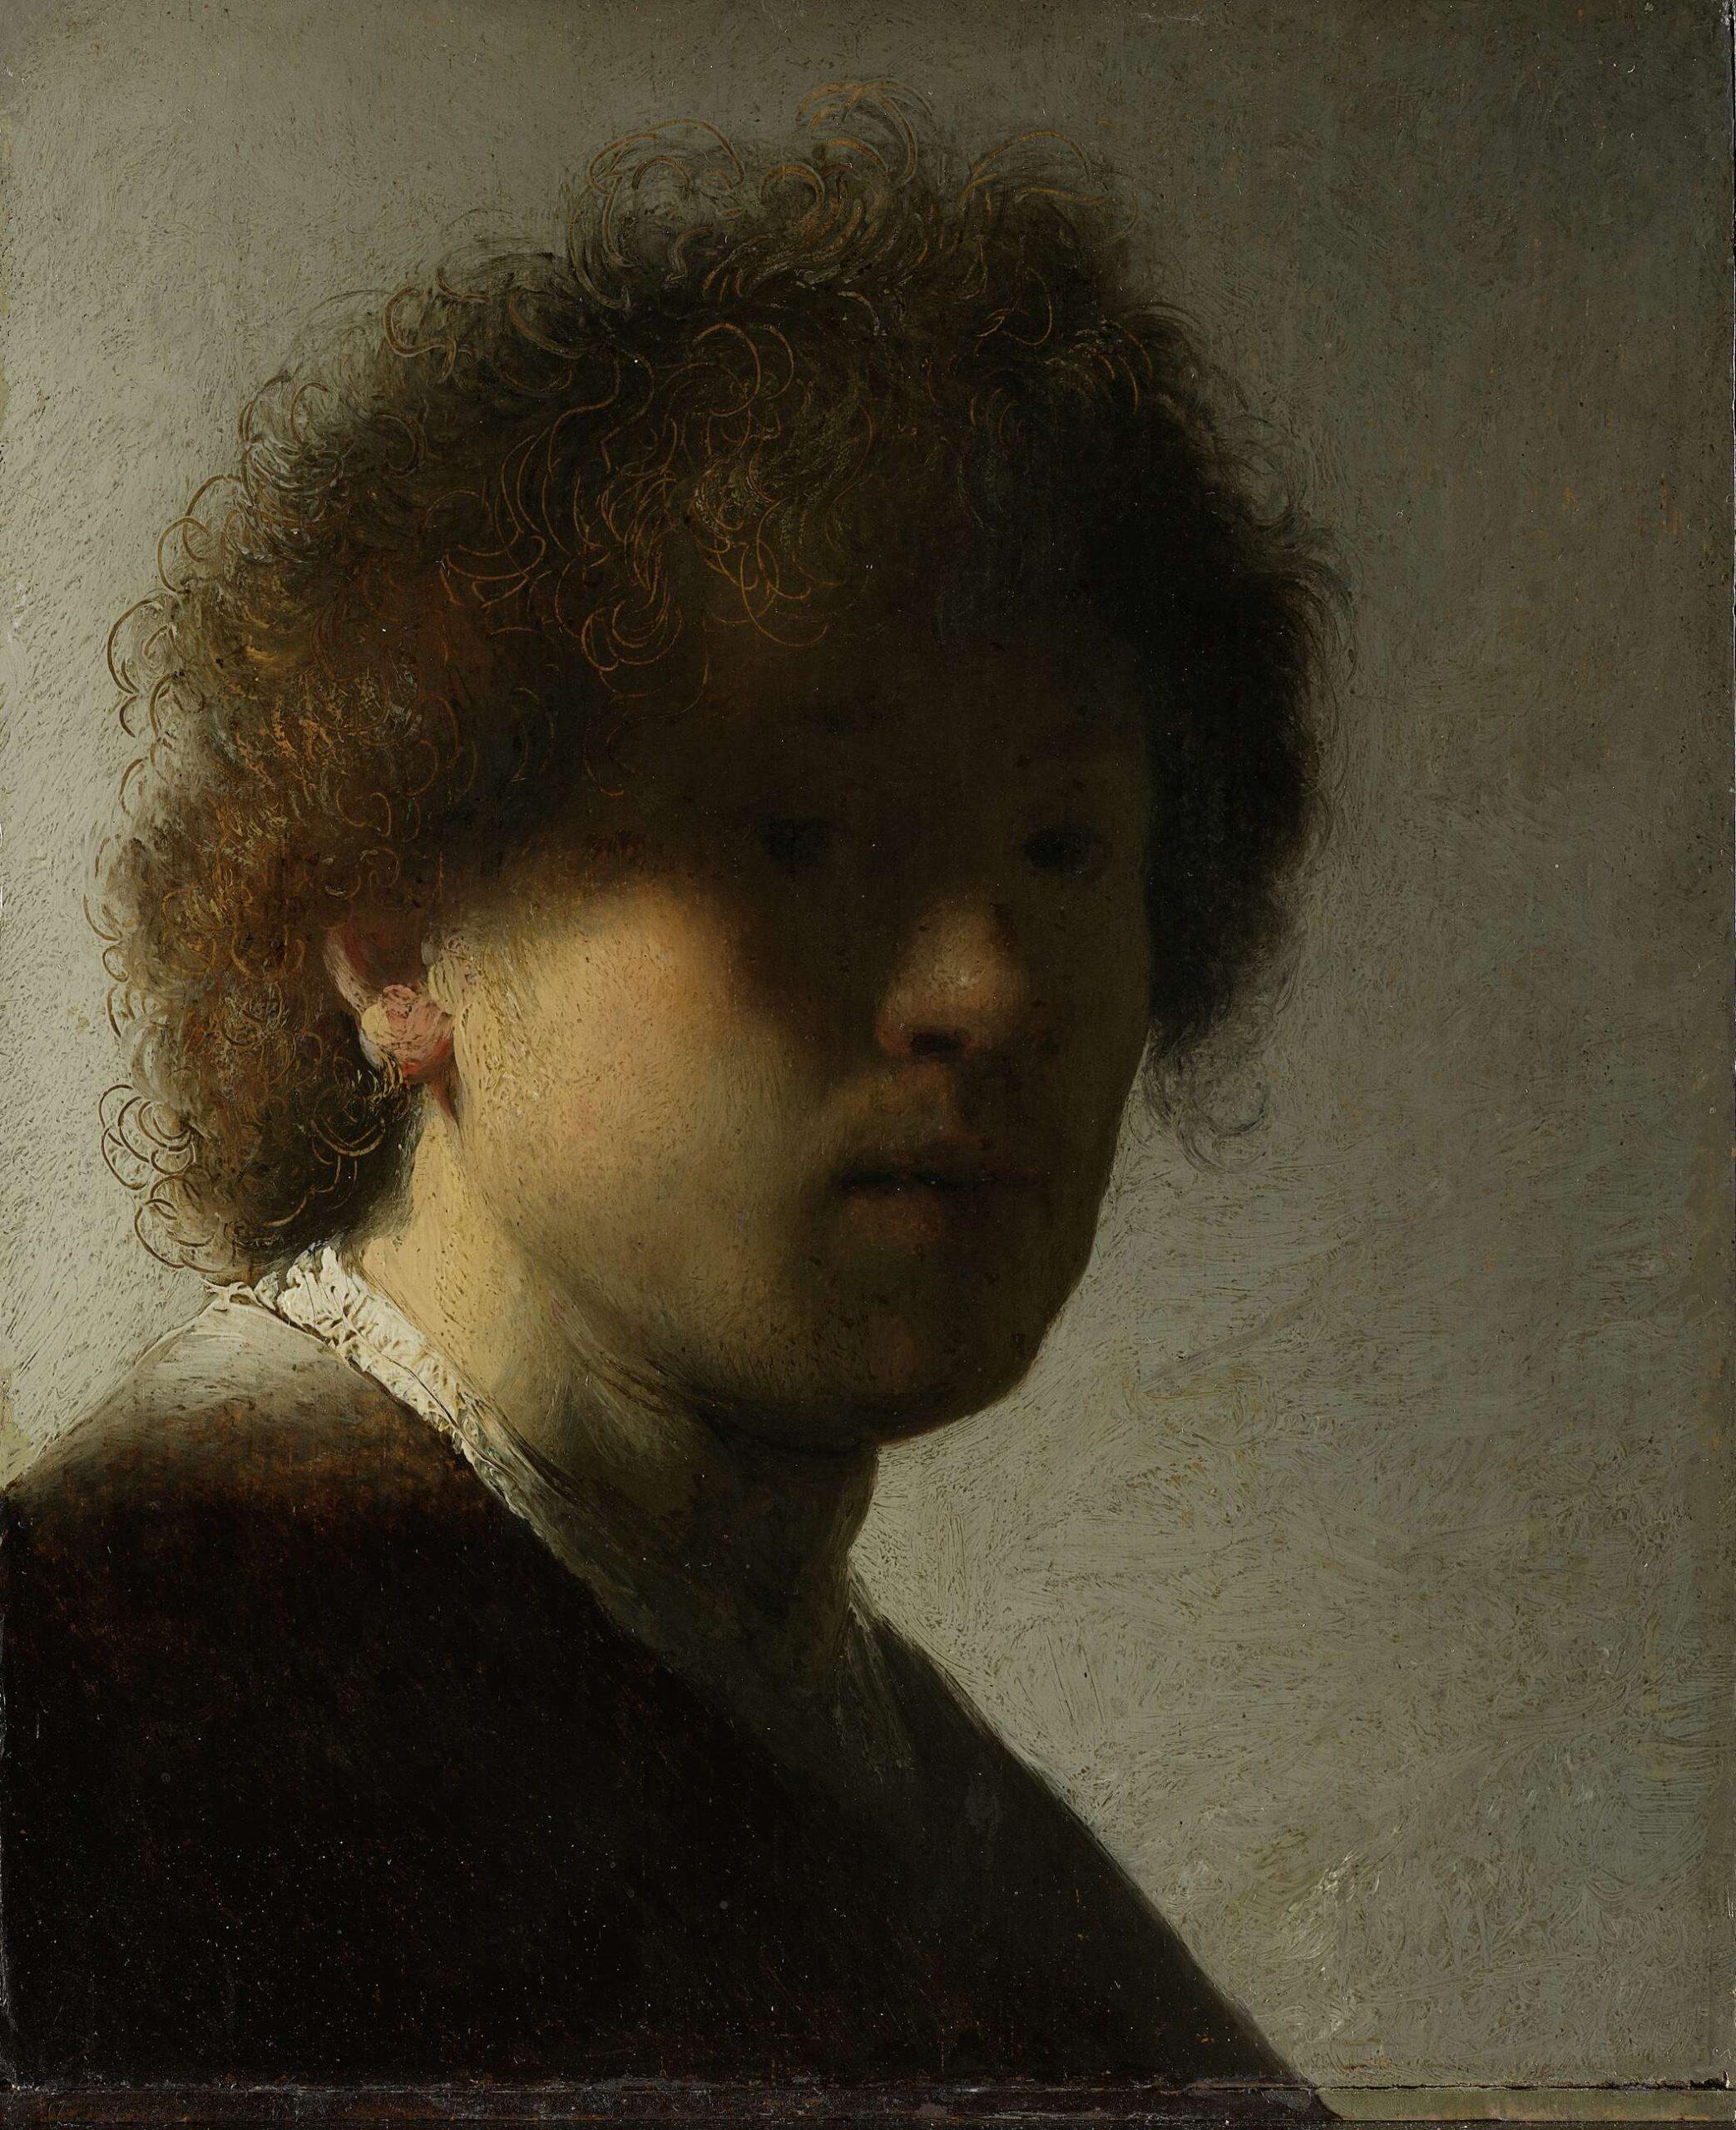 Rembrandt van Rijn (1606-1669), <em>Self-Portrait</em>, 1628<br/> Rijksmuseum, Amsterdam